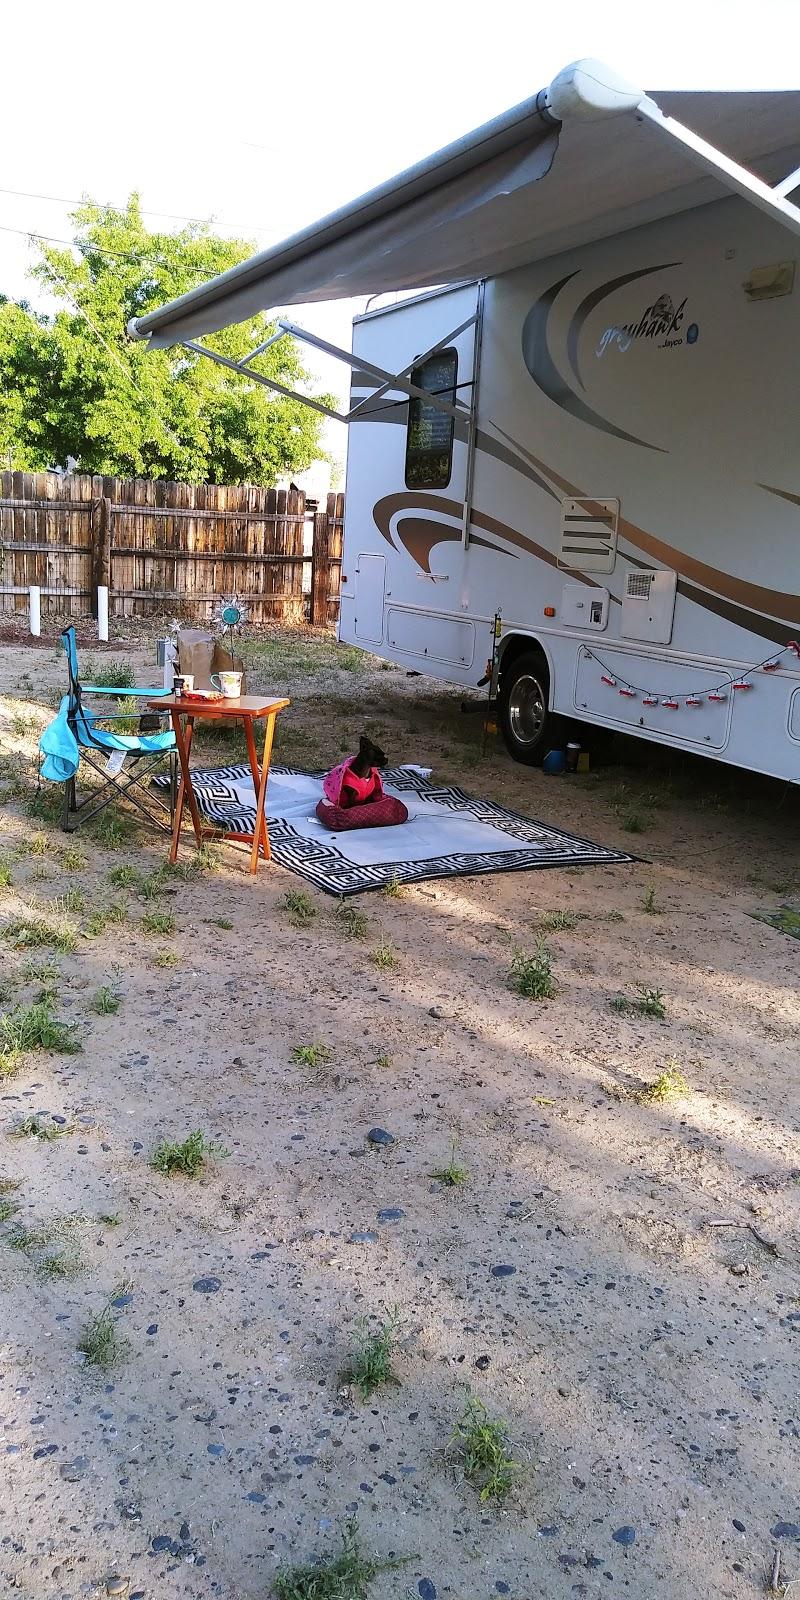 McTribe RV Park - lodging  | Photo 1 of 8 | Address: 4573 1st N Ave Box 349, Joseph City, AZ 86032, USA | Phone: (928) 587-7444